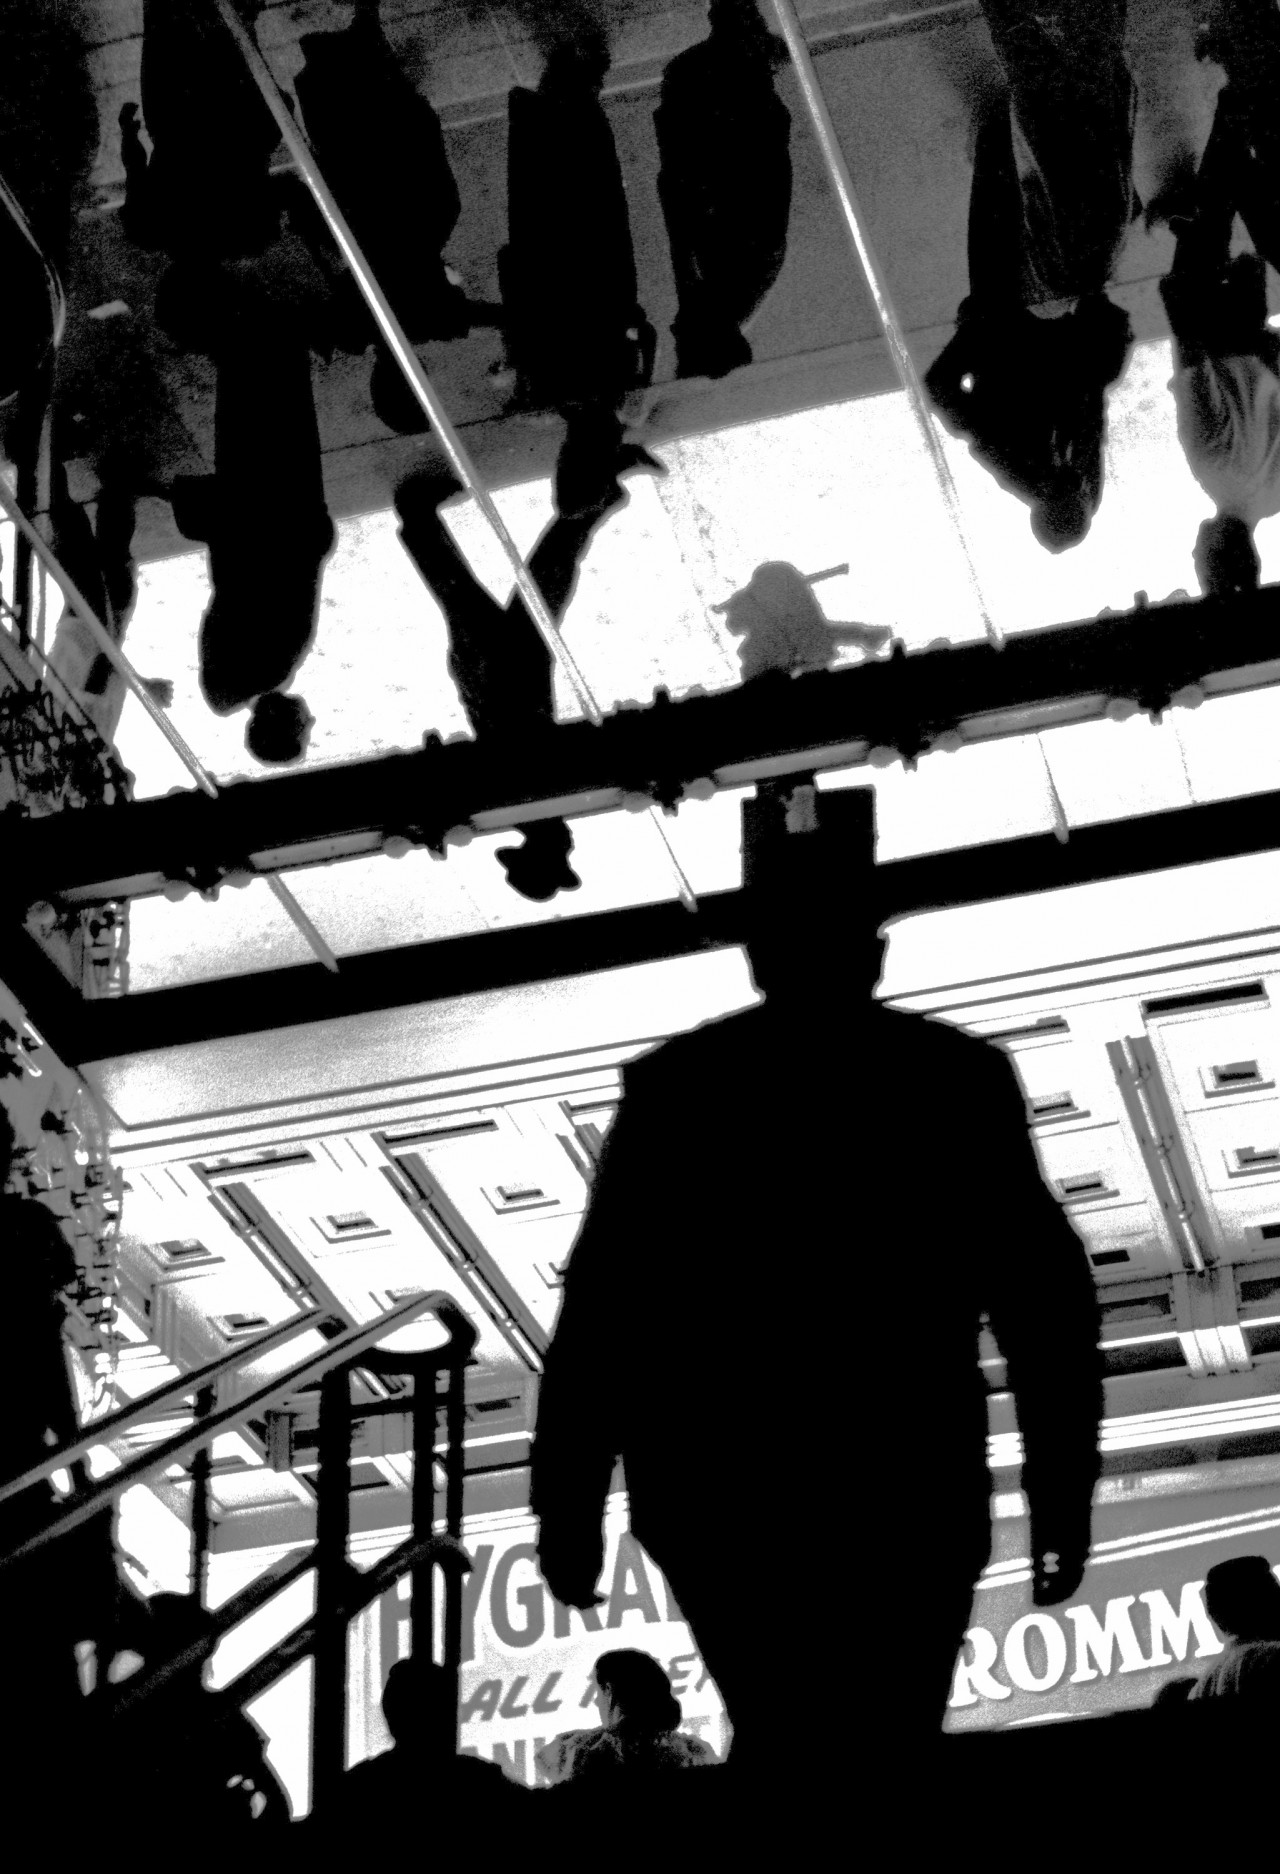 Выход из станции метро, Нью-Йорк, 1945. Фотограф Фред Стайн